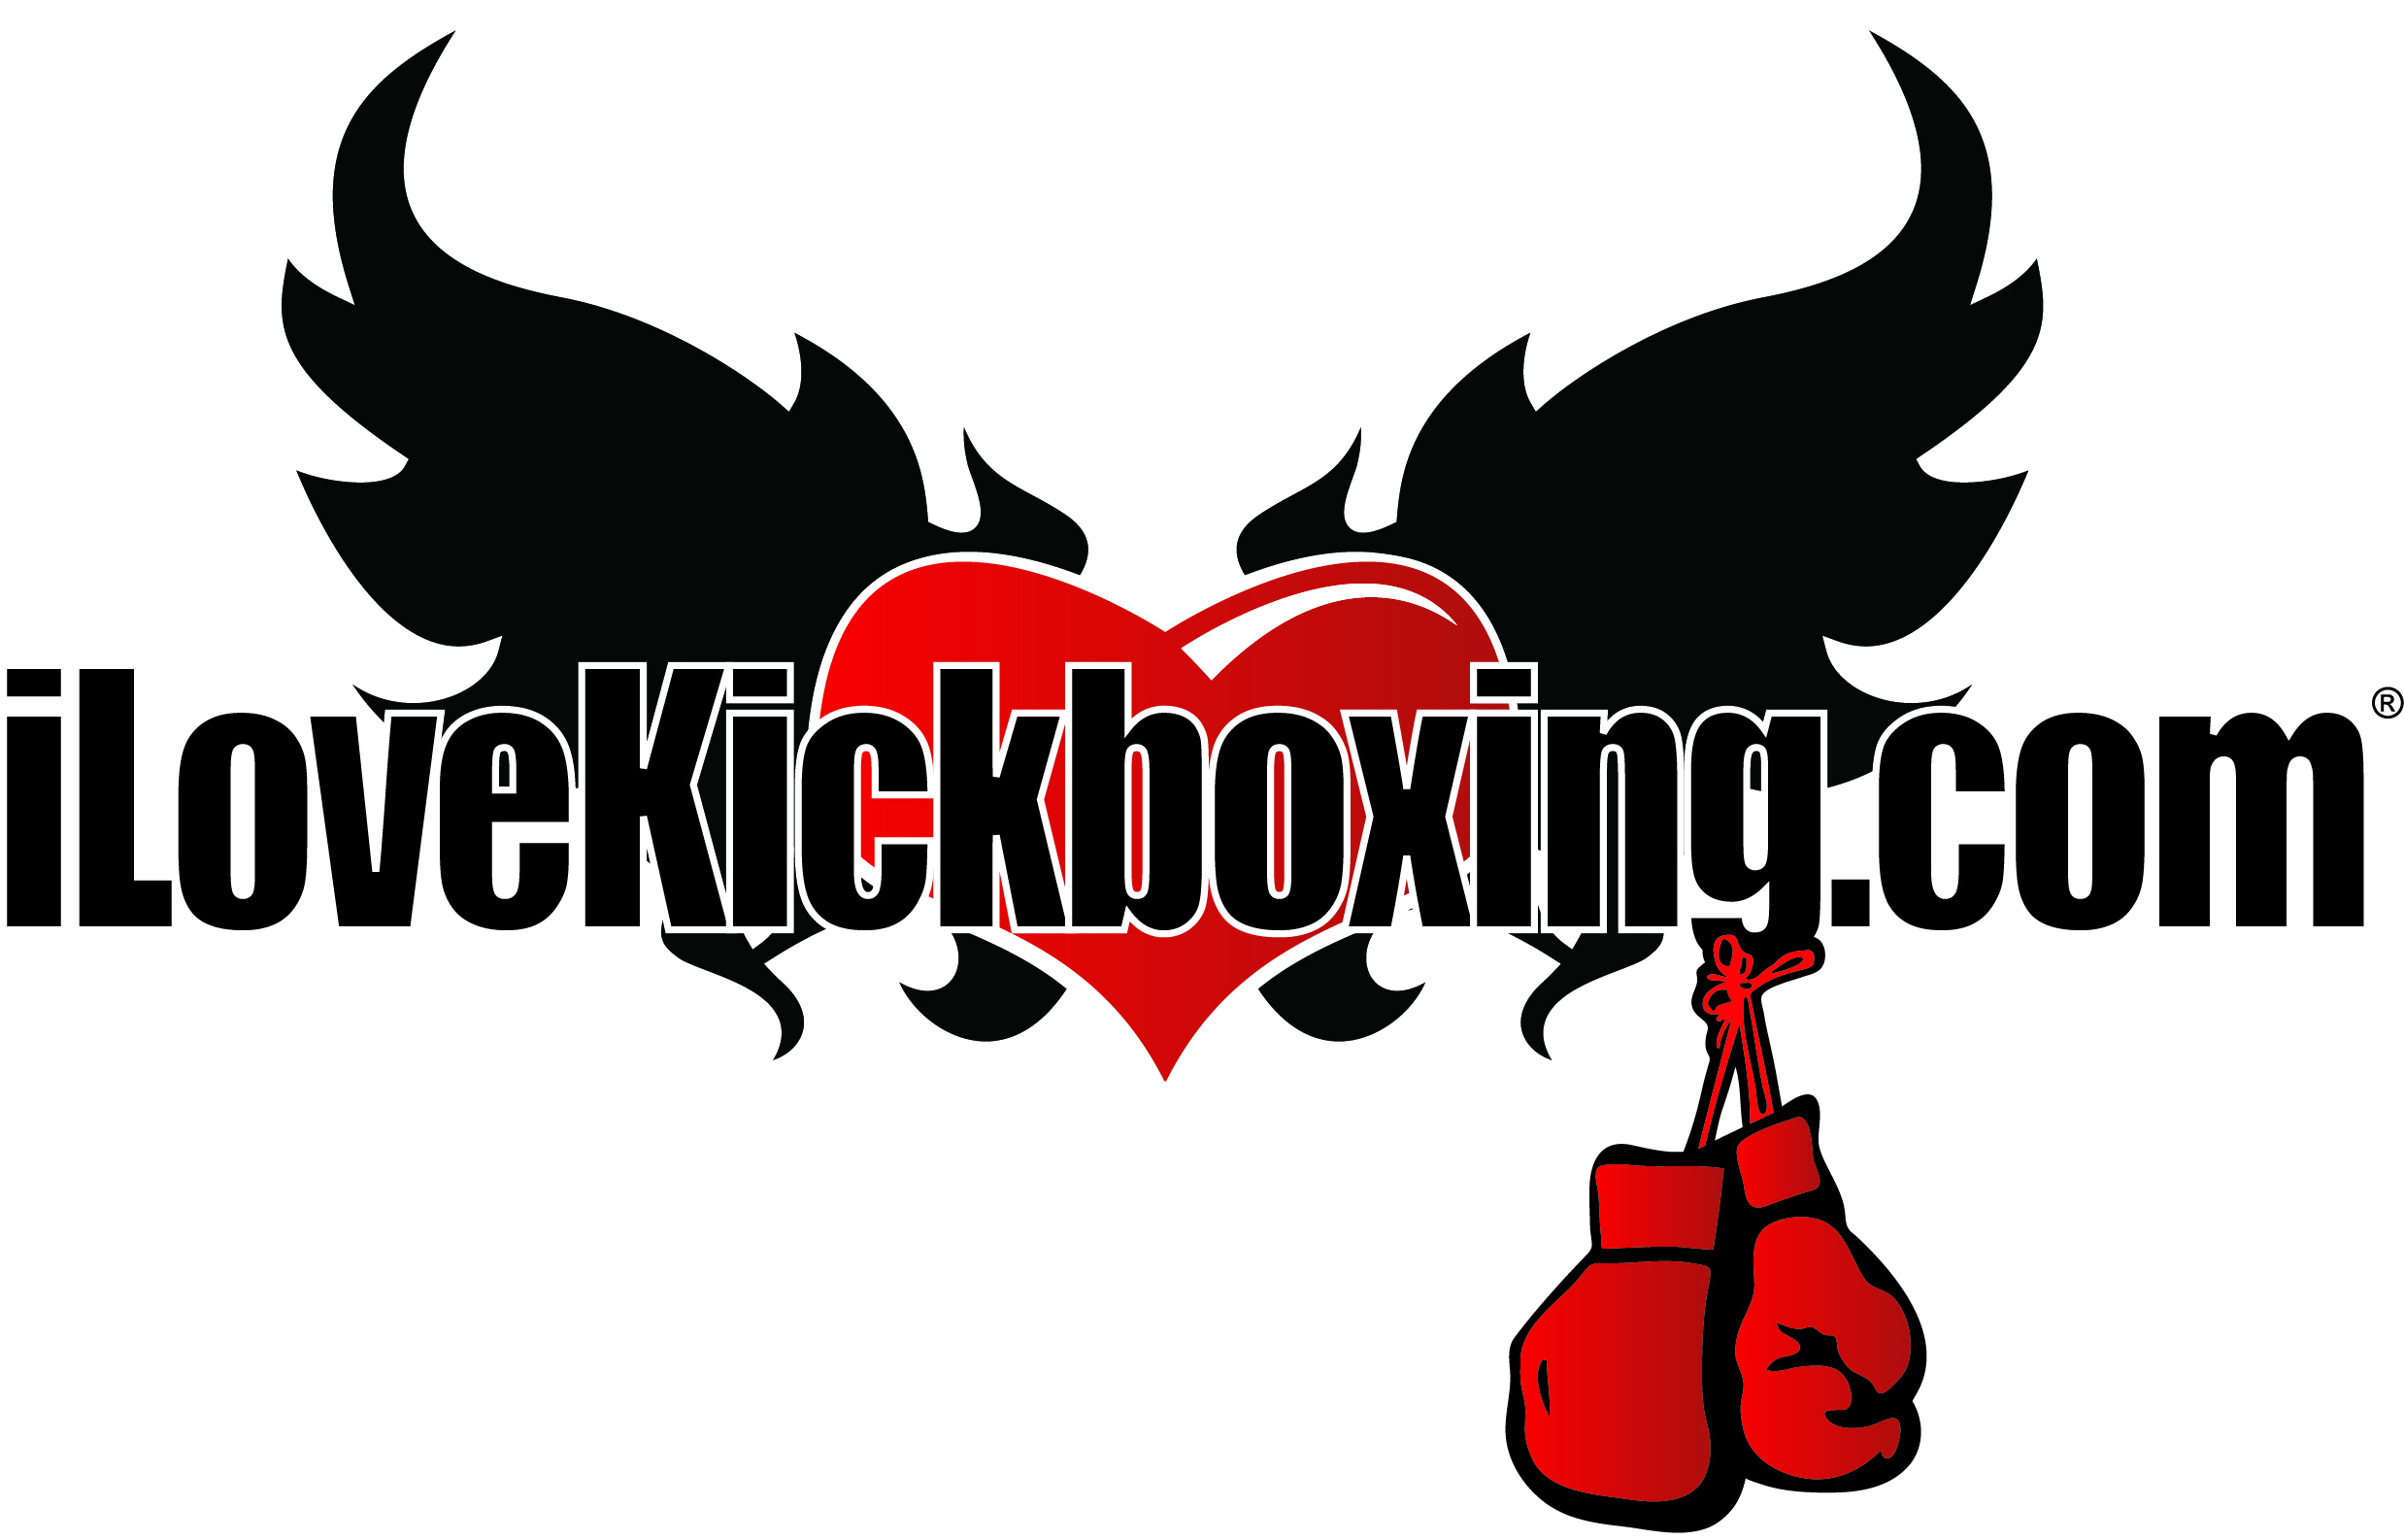 I Love Kickboxing - Northwest Las Vegas - Las Vegas, NV - Health Clubs & Gyms